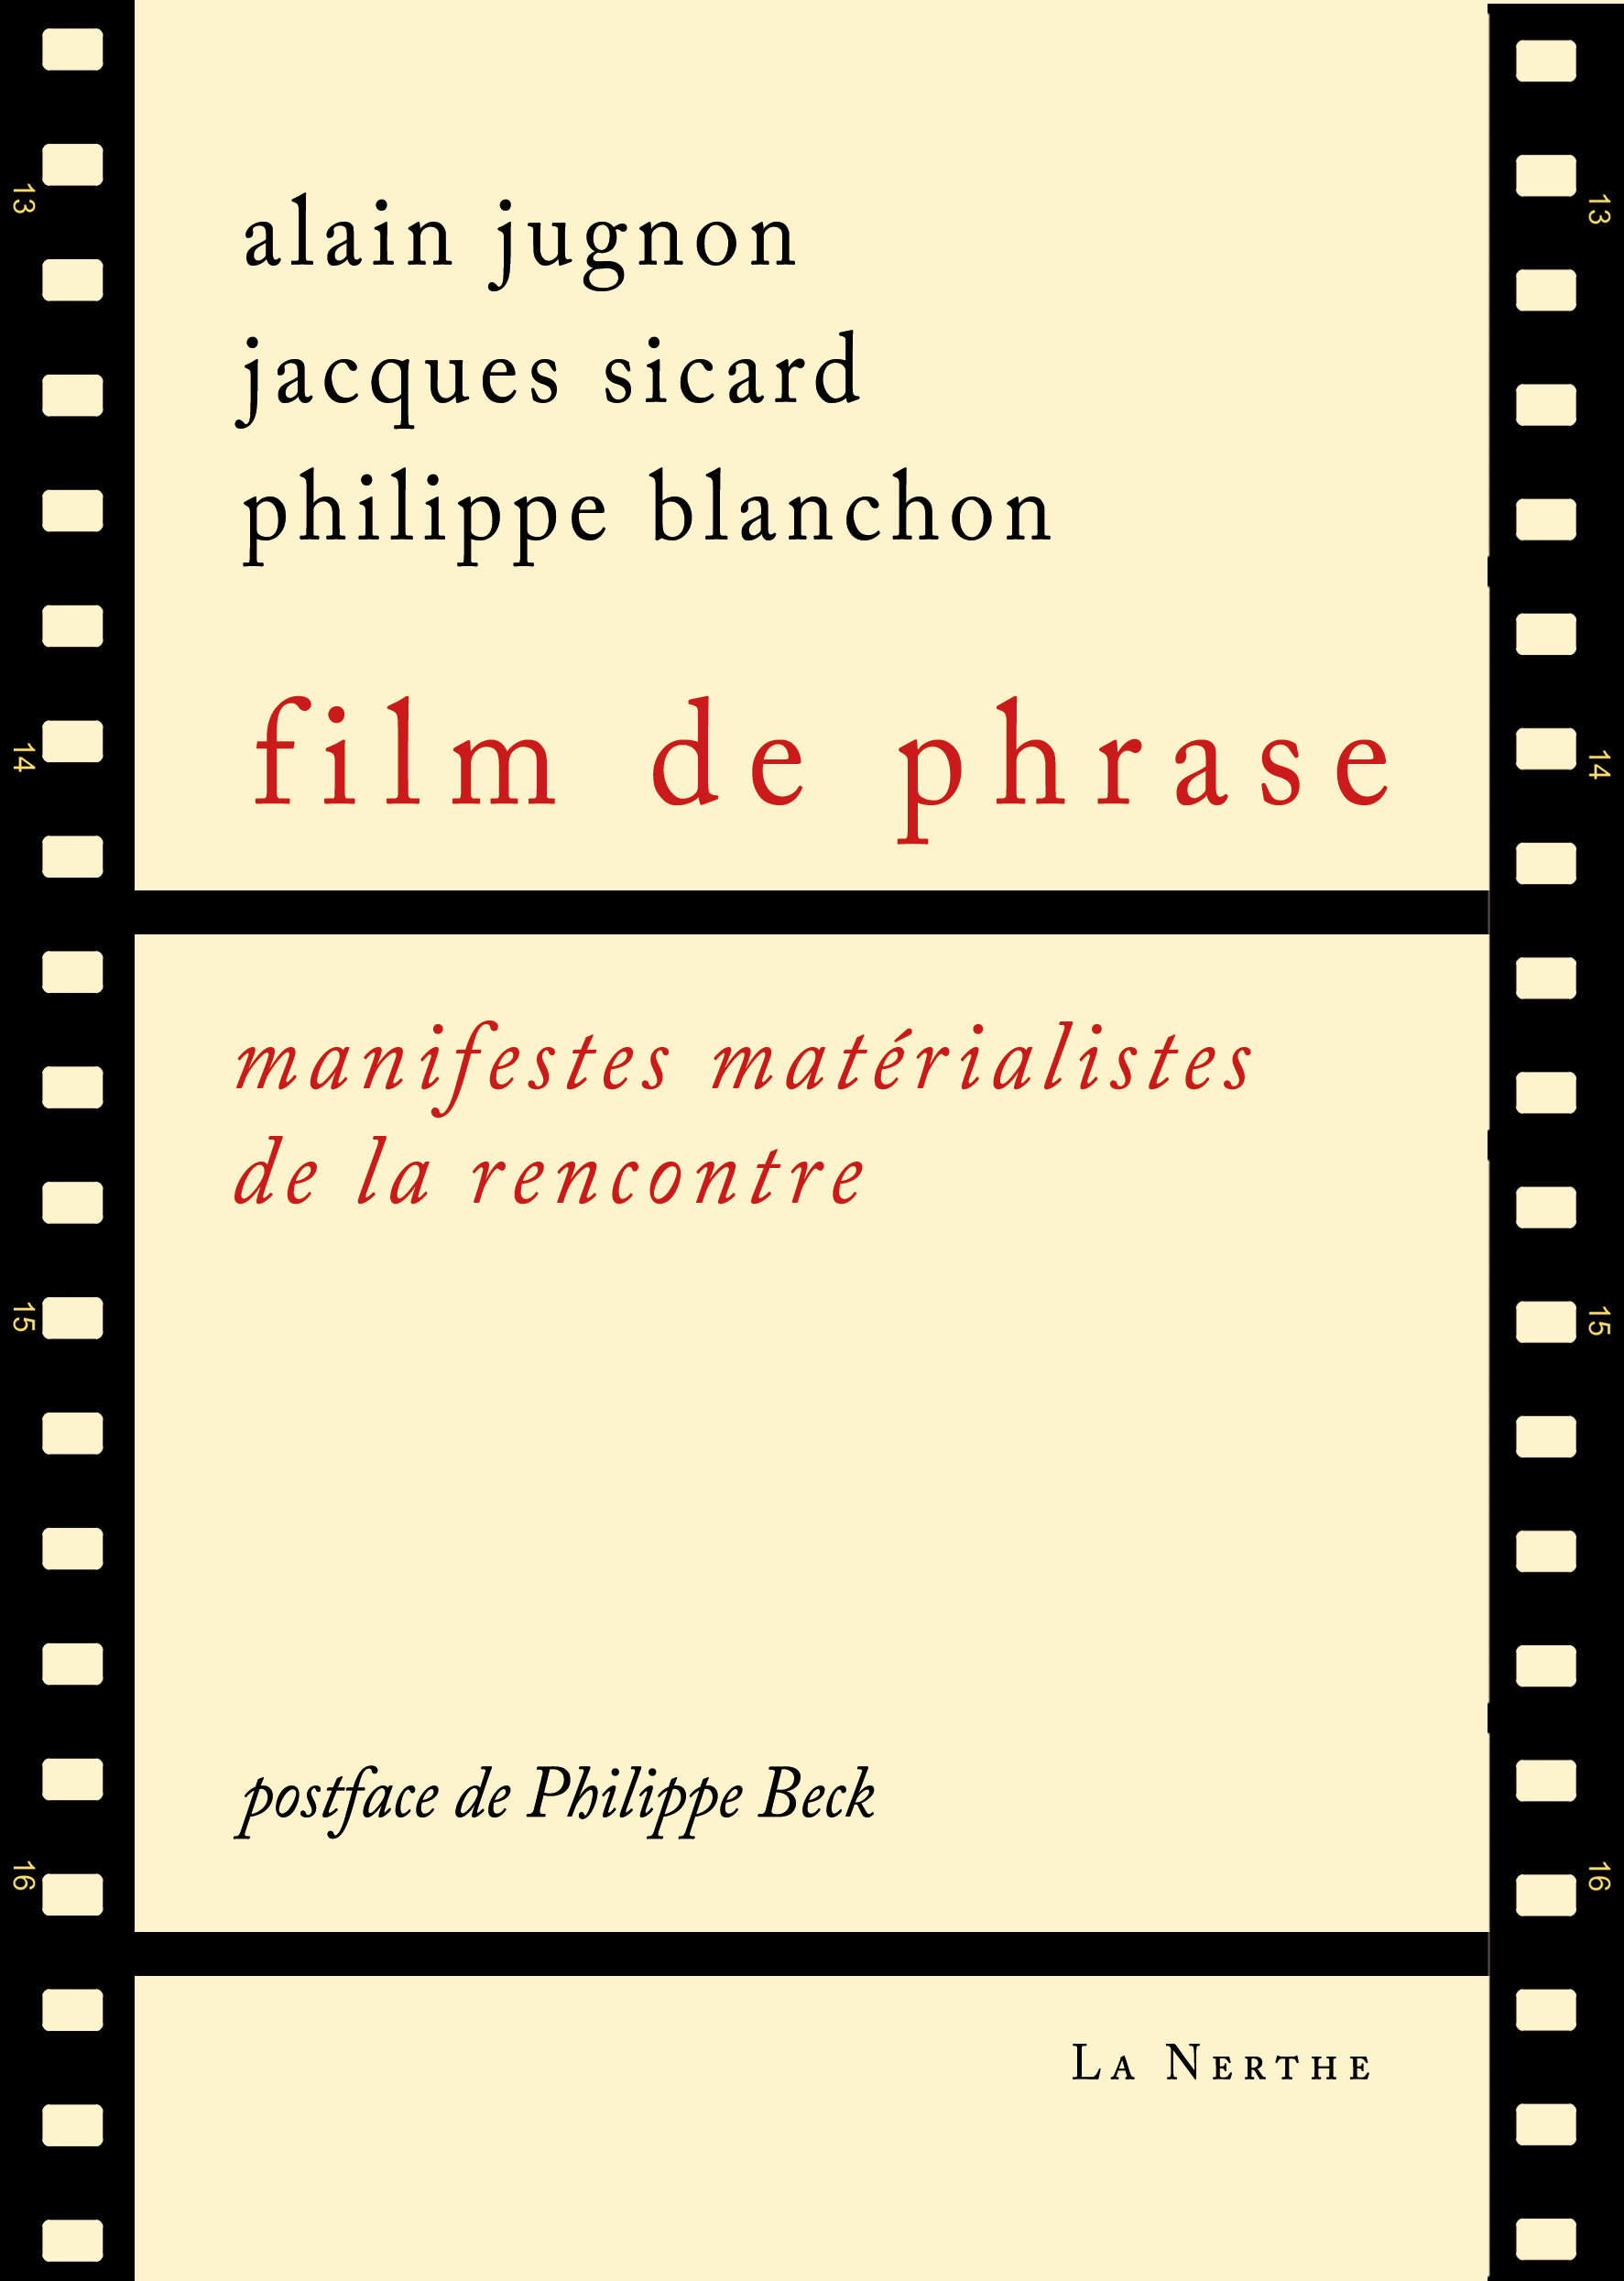 FILM DE PHRASE - MANIFESTES MATERIALISTES DE LA RENCONTRE